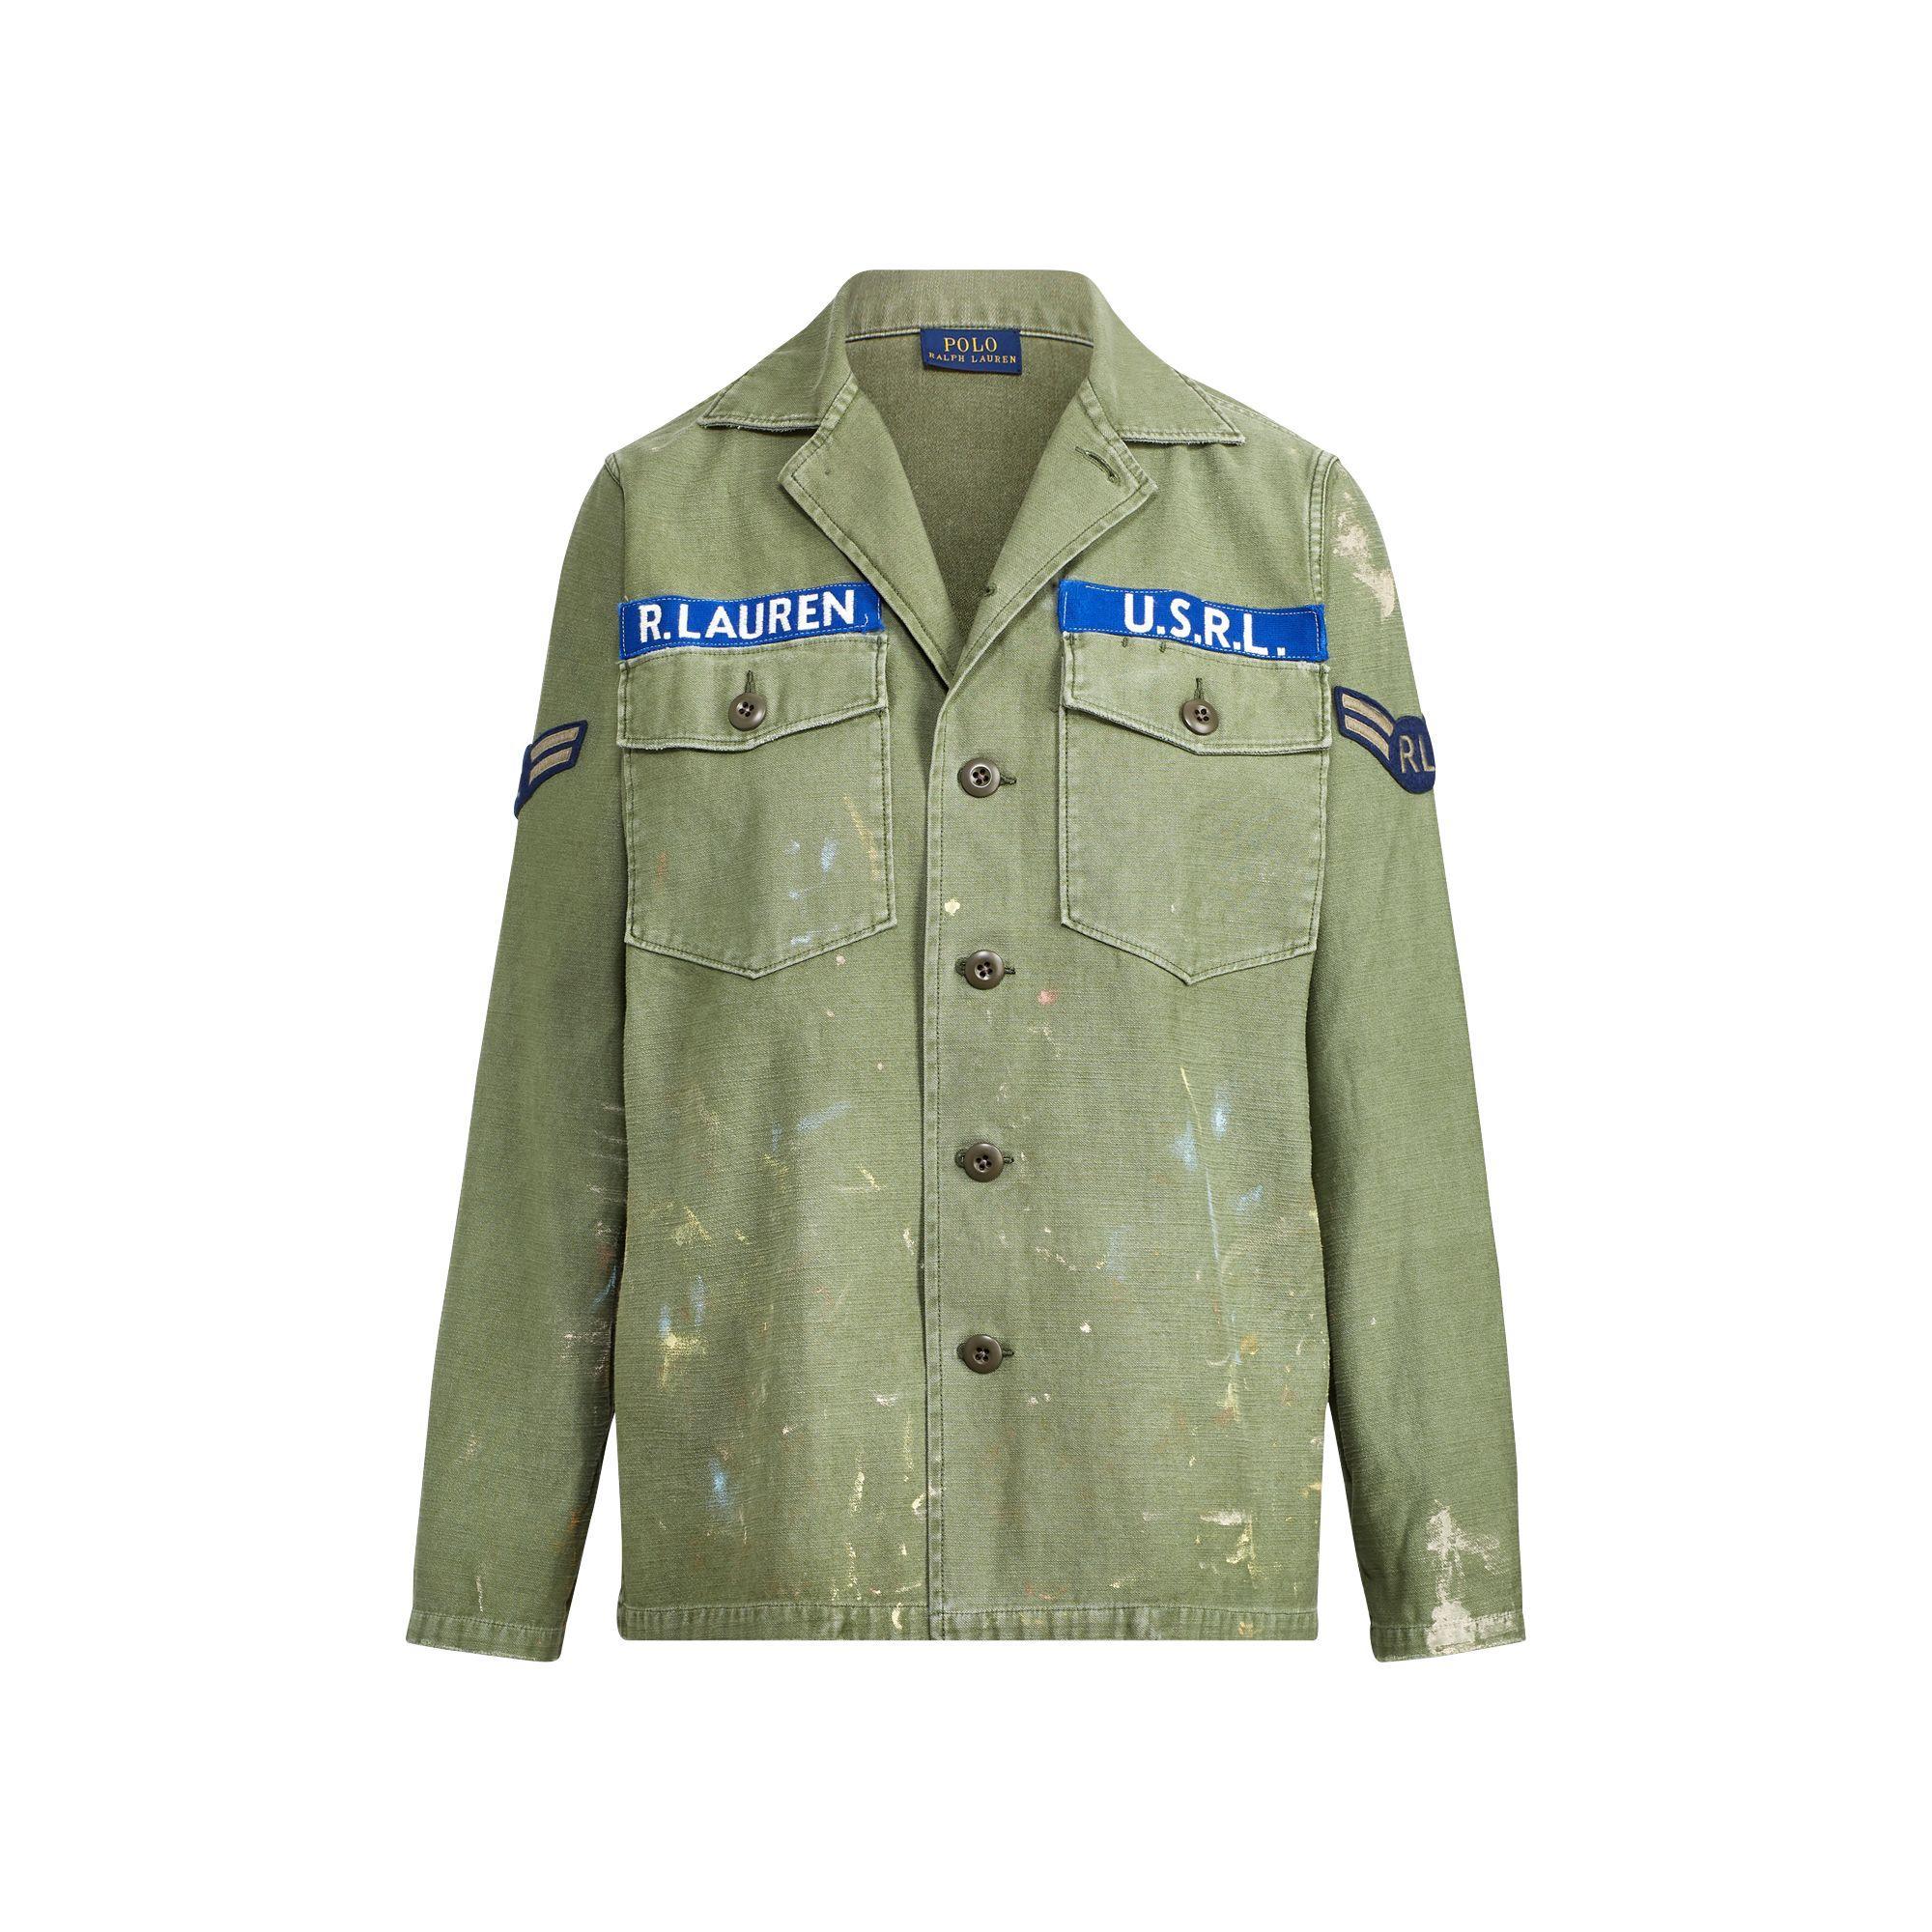 4bc9f8a156efb3 Polo Ralph Lauren - Green Painted Patchwork Satin Shirt - Lyst. View  fullscreen